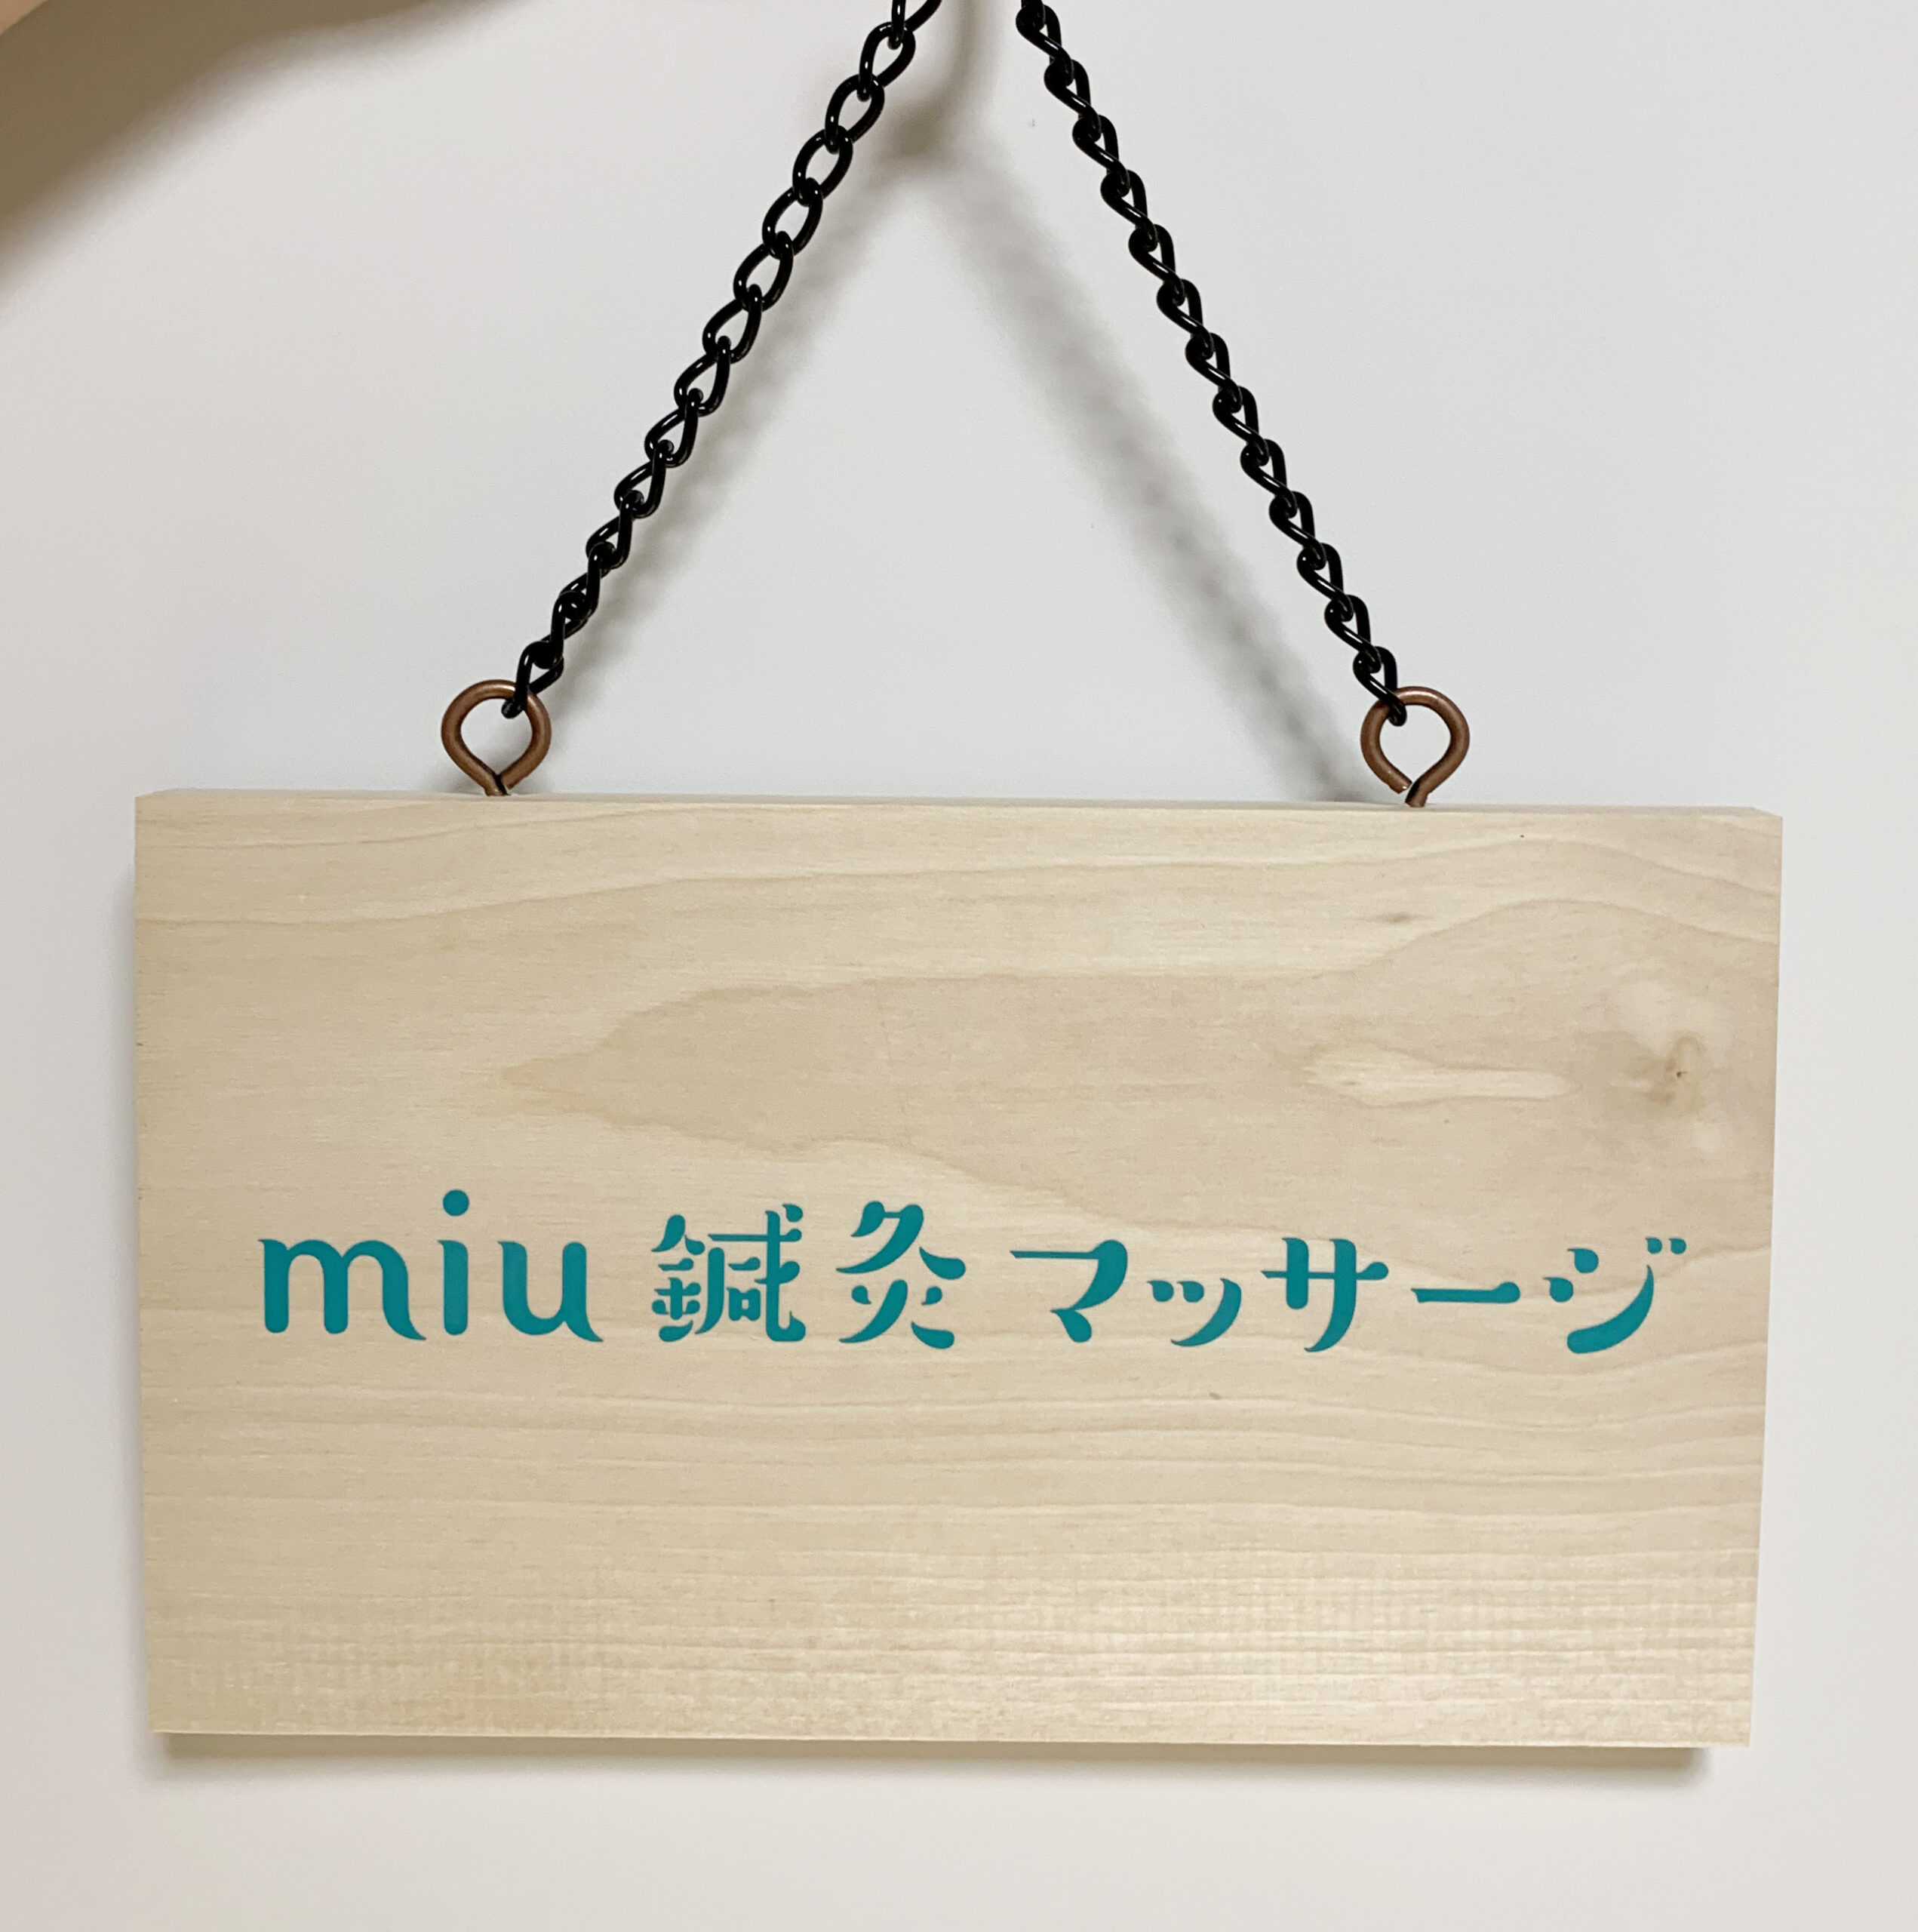 miu鍼灸マッサージ・木製吊り看板